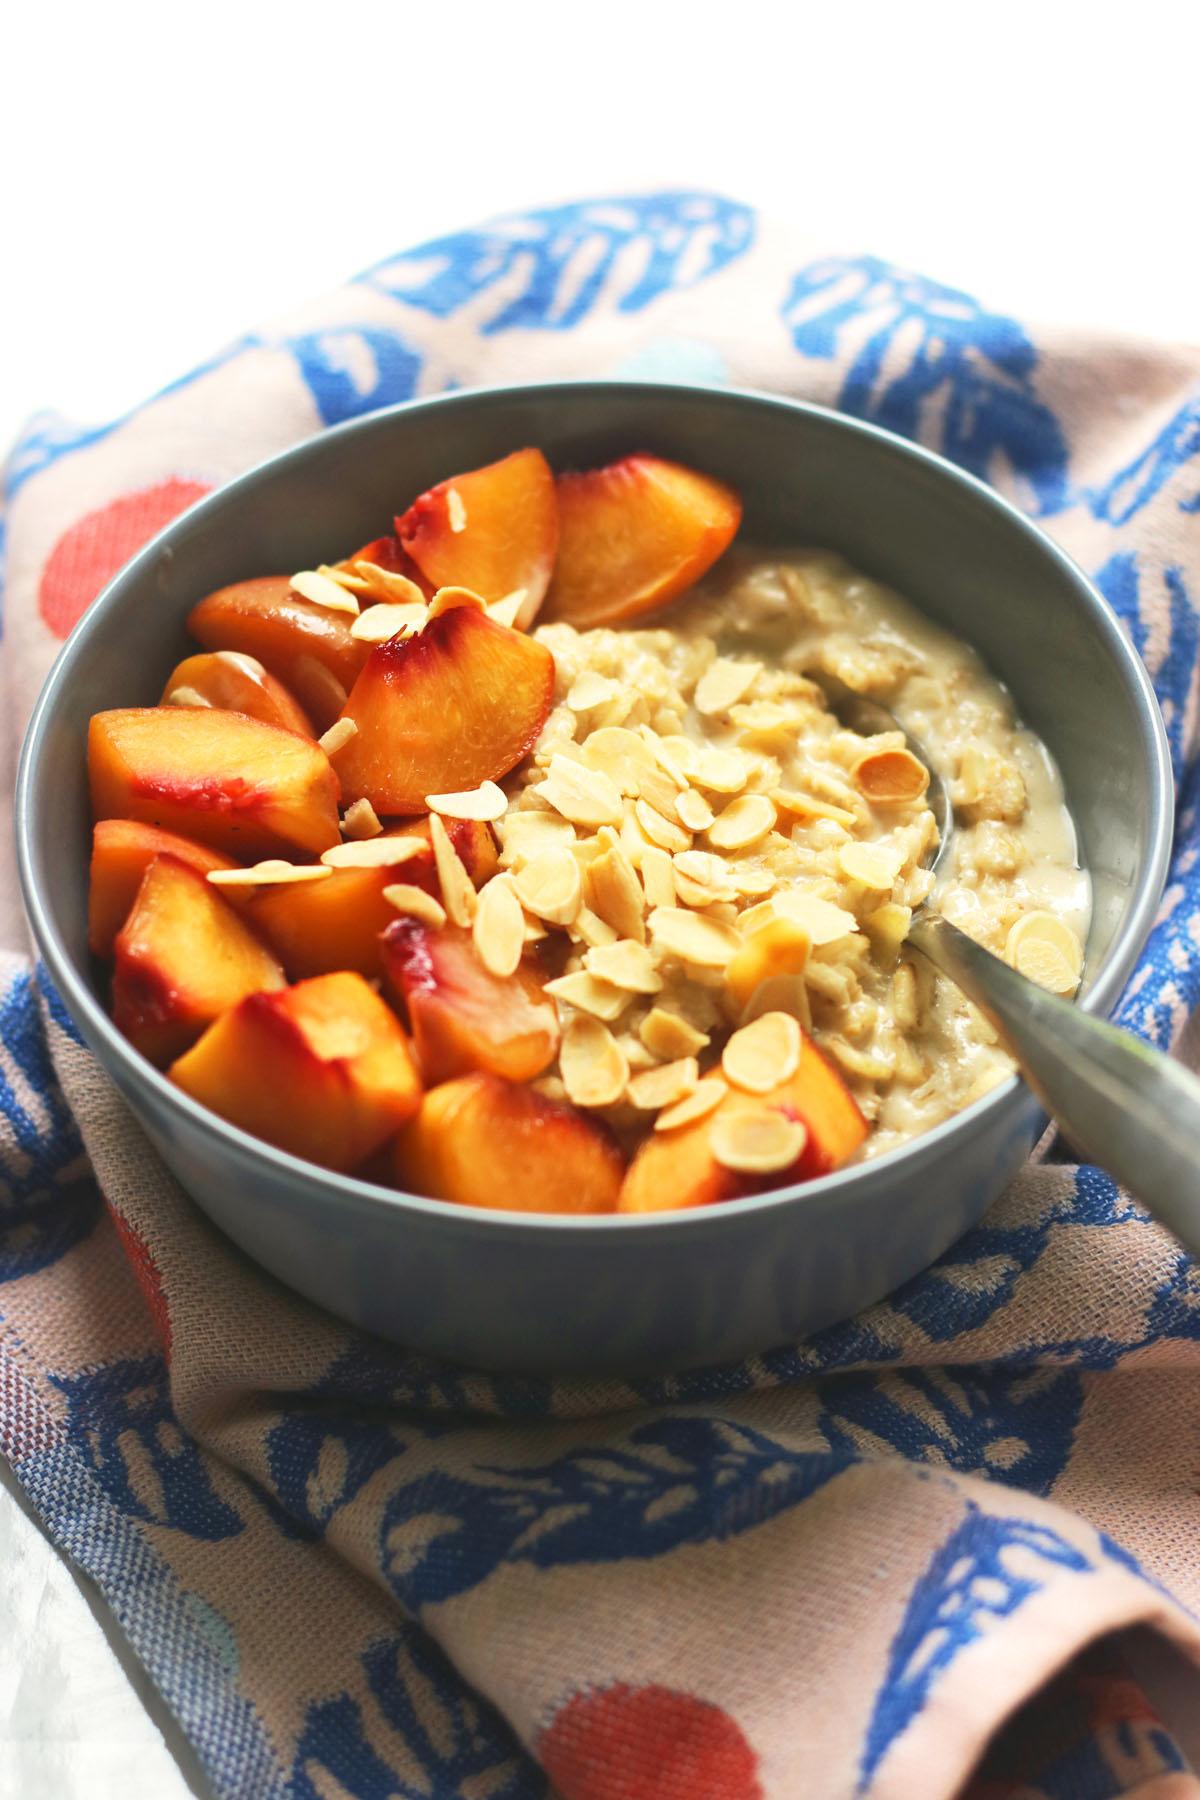 Cardamom porridge with almonds and peaches